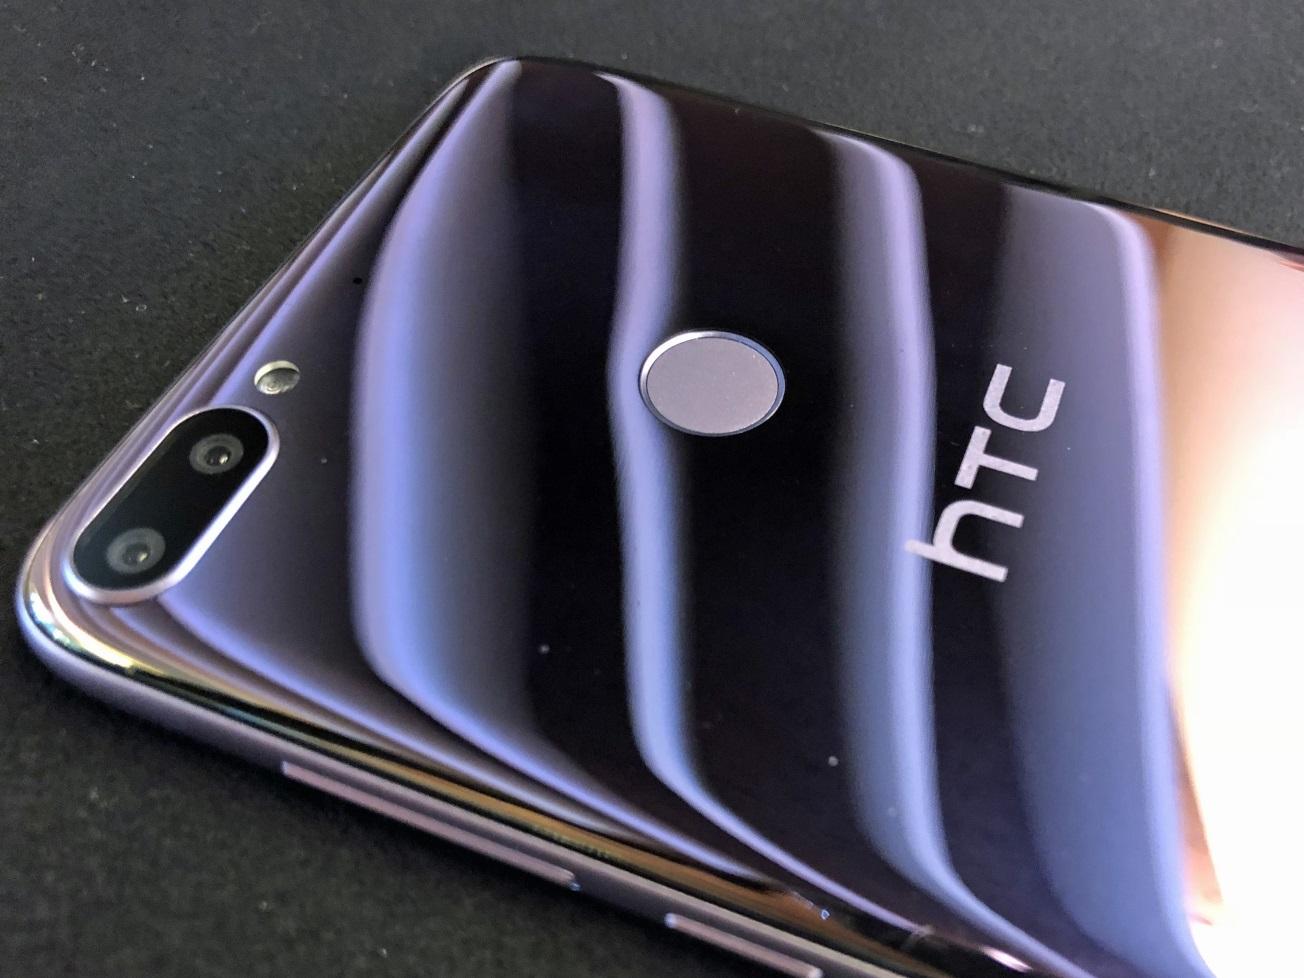 Das HTC Desire 12+ in Lila mit Dual-Kamera.